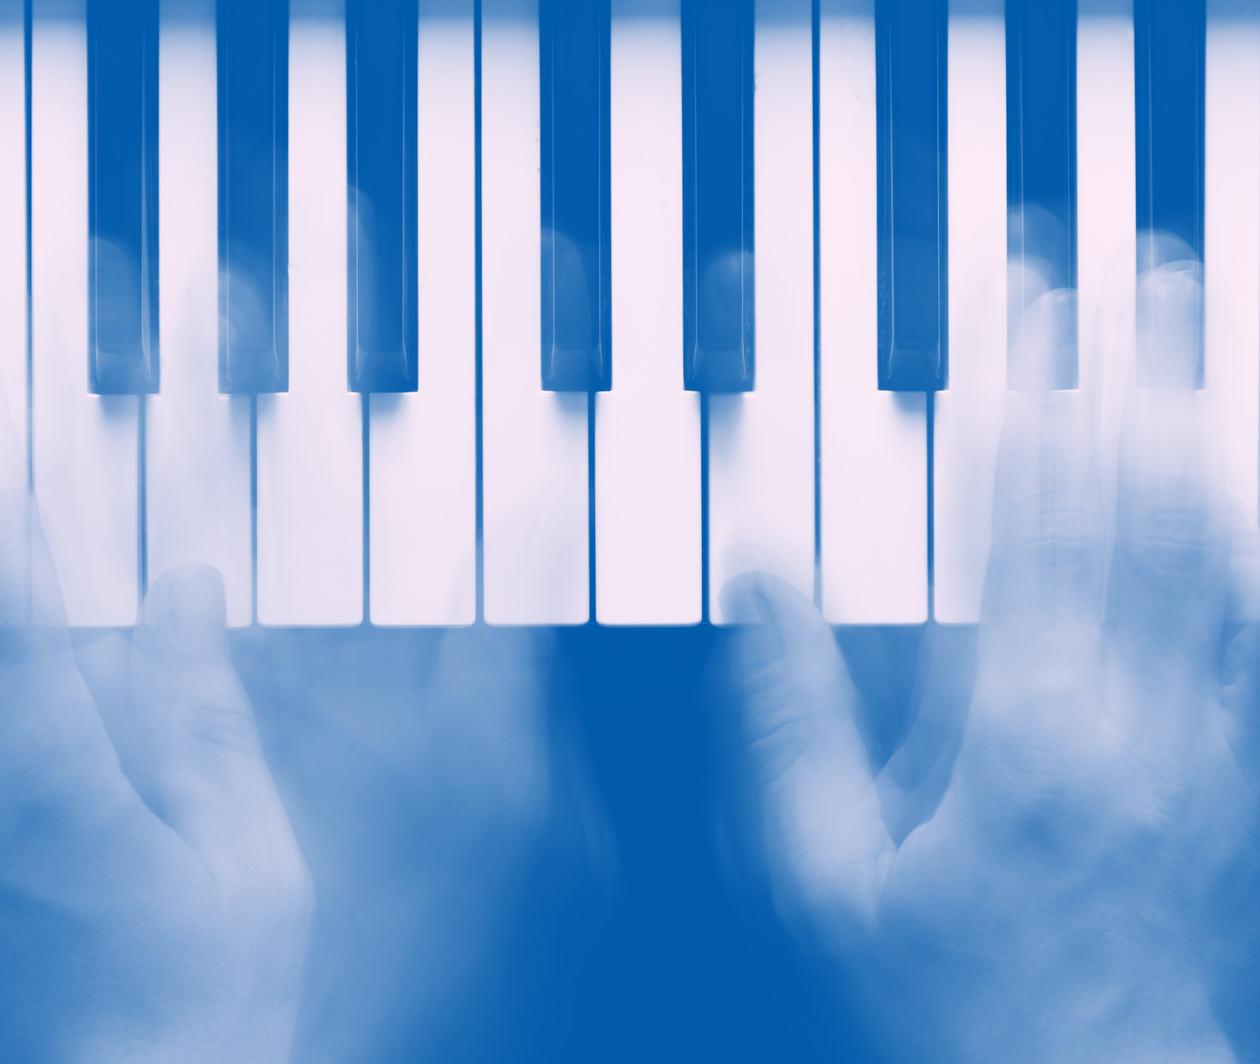 Learn Jazz Piano: II. Improvising on Jazz Standards